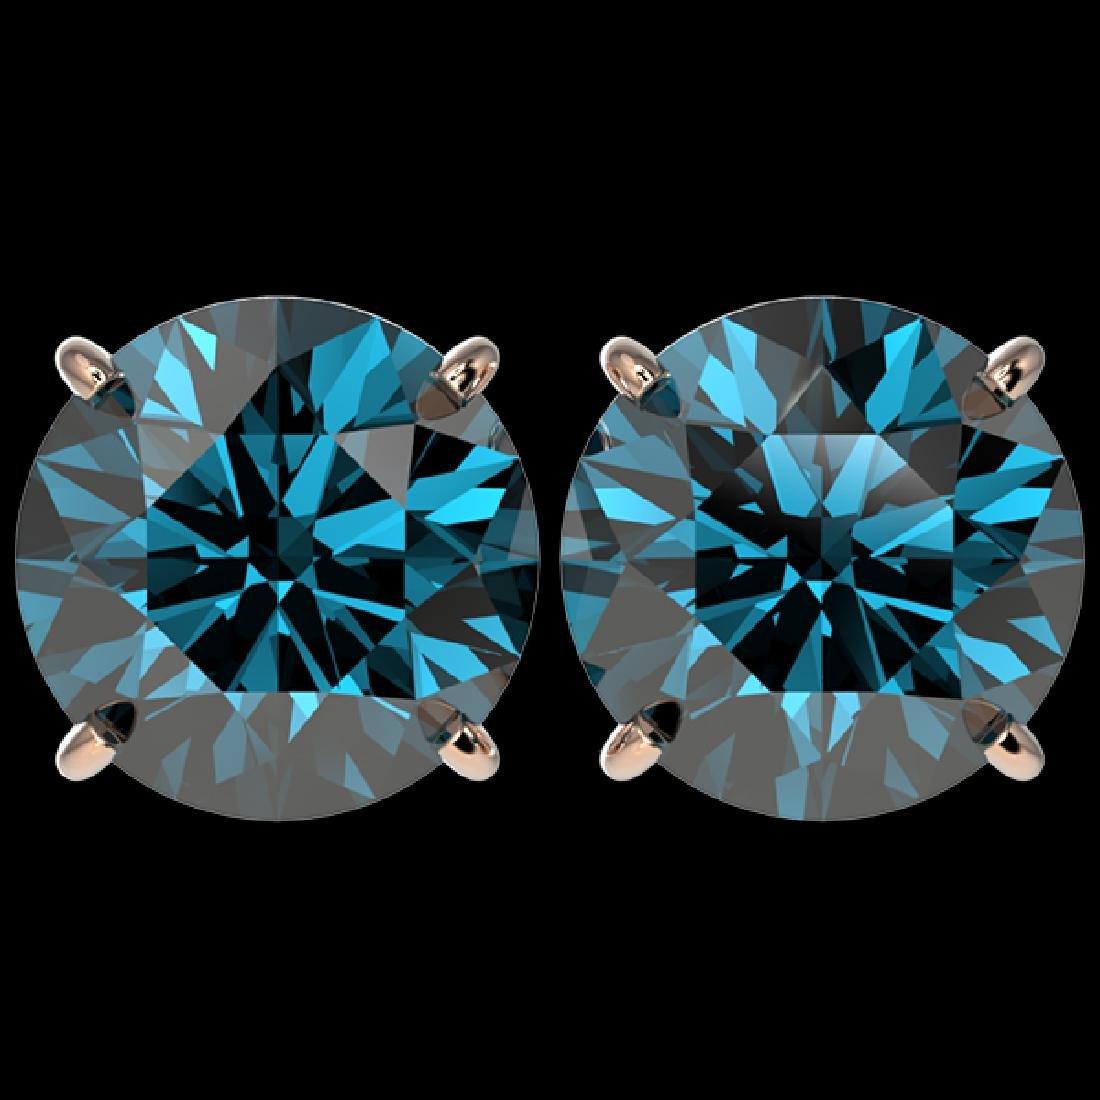 5 CTW Certified Intense Blue SI Diamond Solitaire Stud